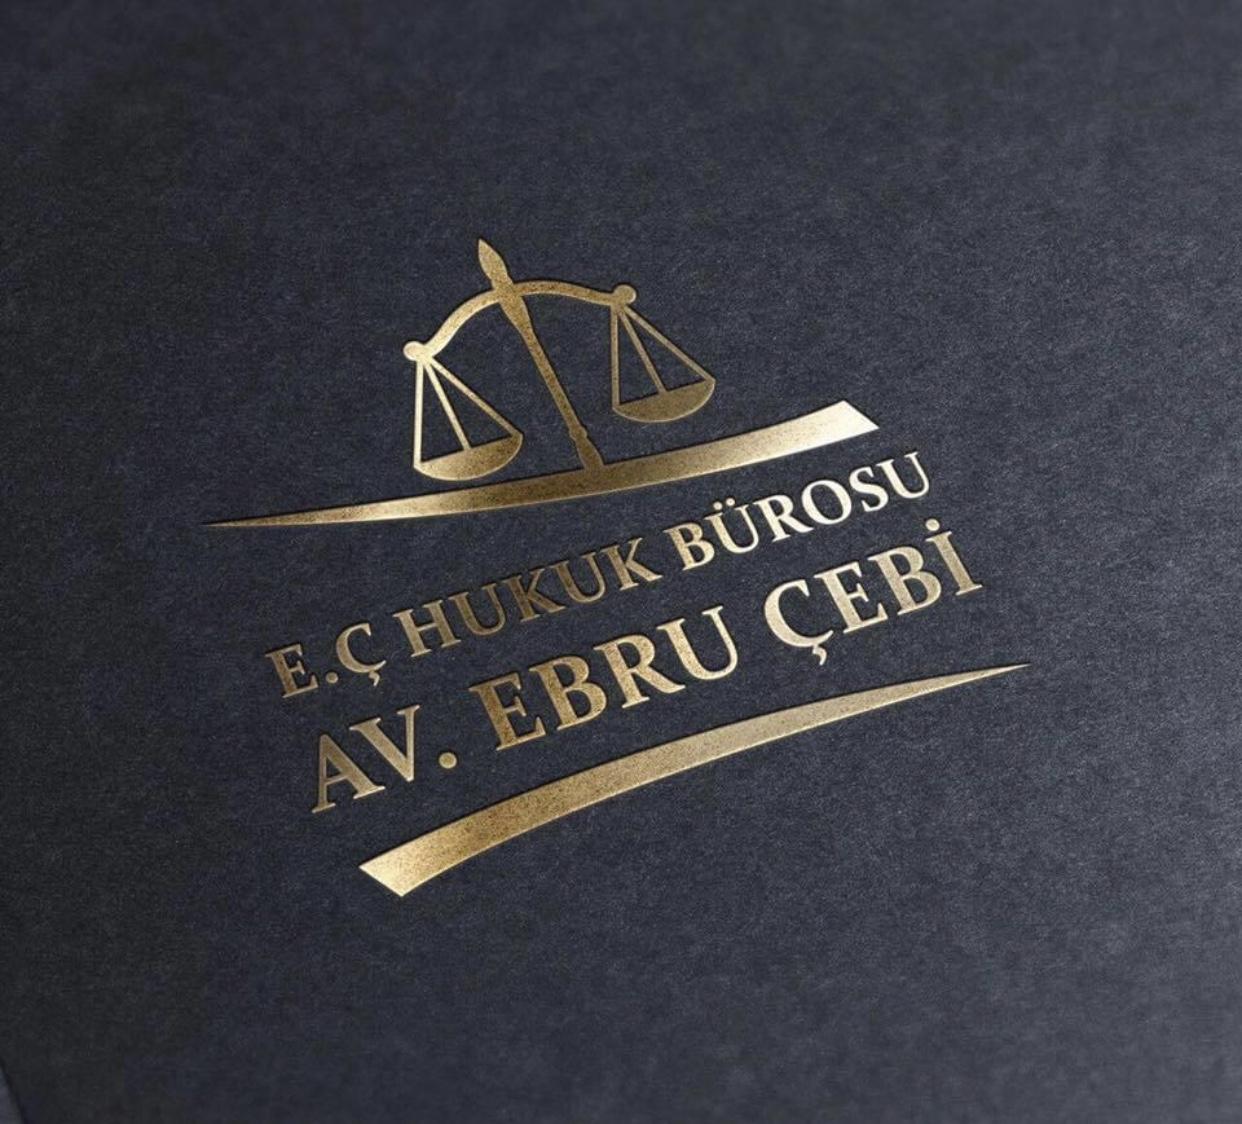 Antalya | Avukat & Arabulucu Ebru ÇEBİ | Avukat Antalya